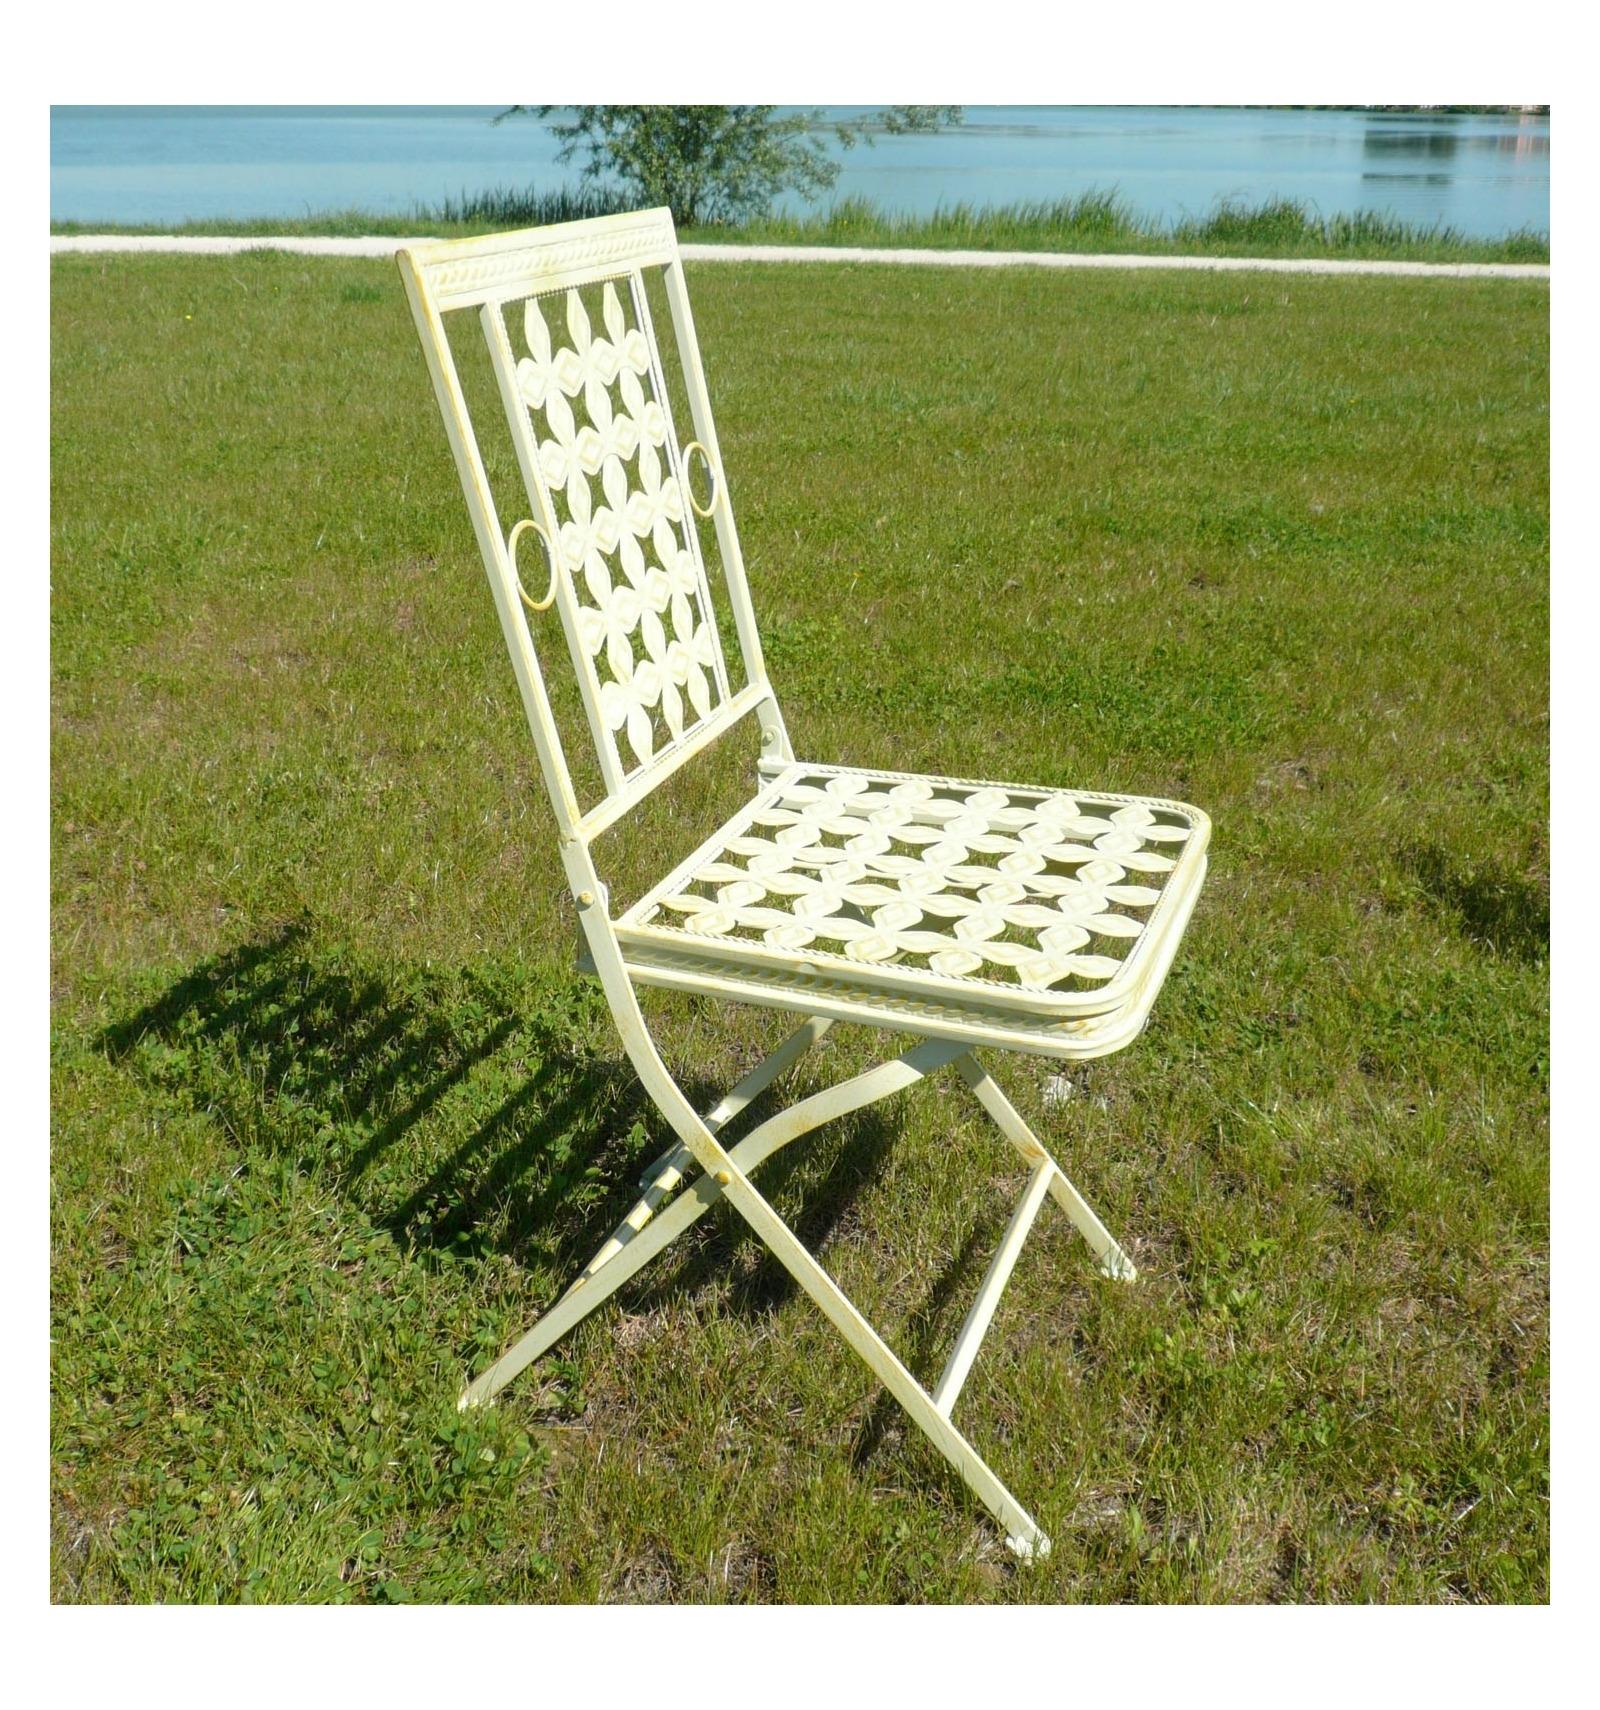 Mobili da giardino in ferro battuto tavoli sedie for Sedie da giardino in ferro battuto